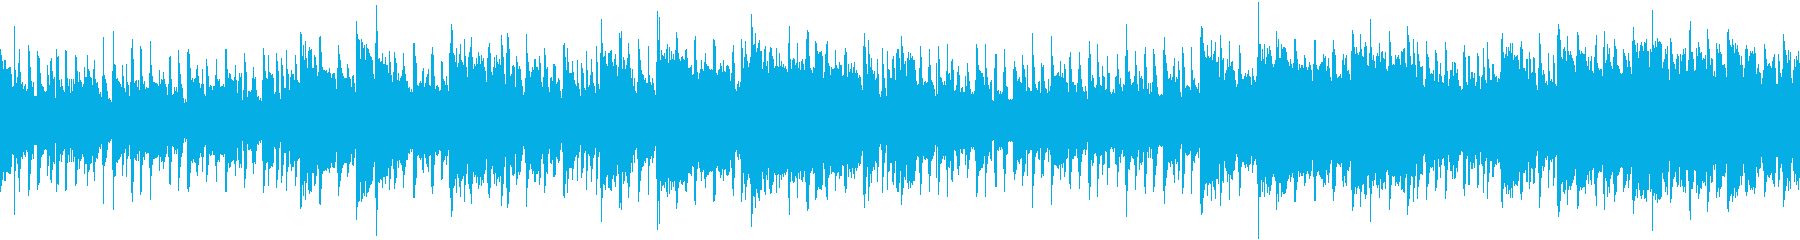 Cartoon エレキギター コミ...の再生済みの波形